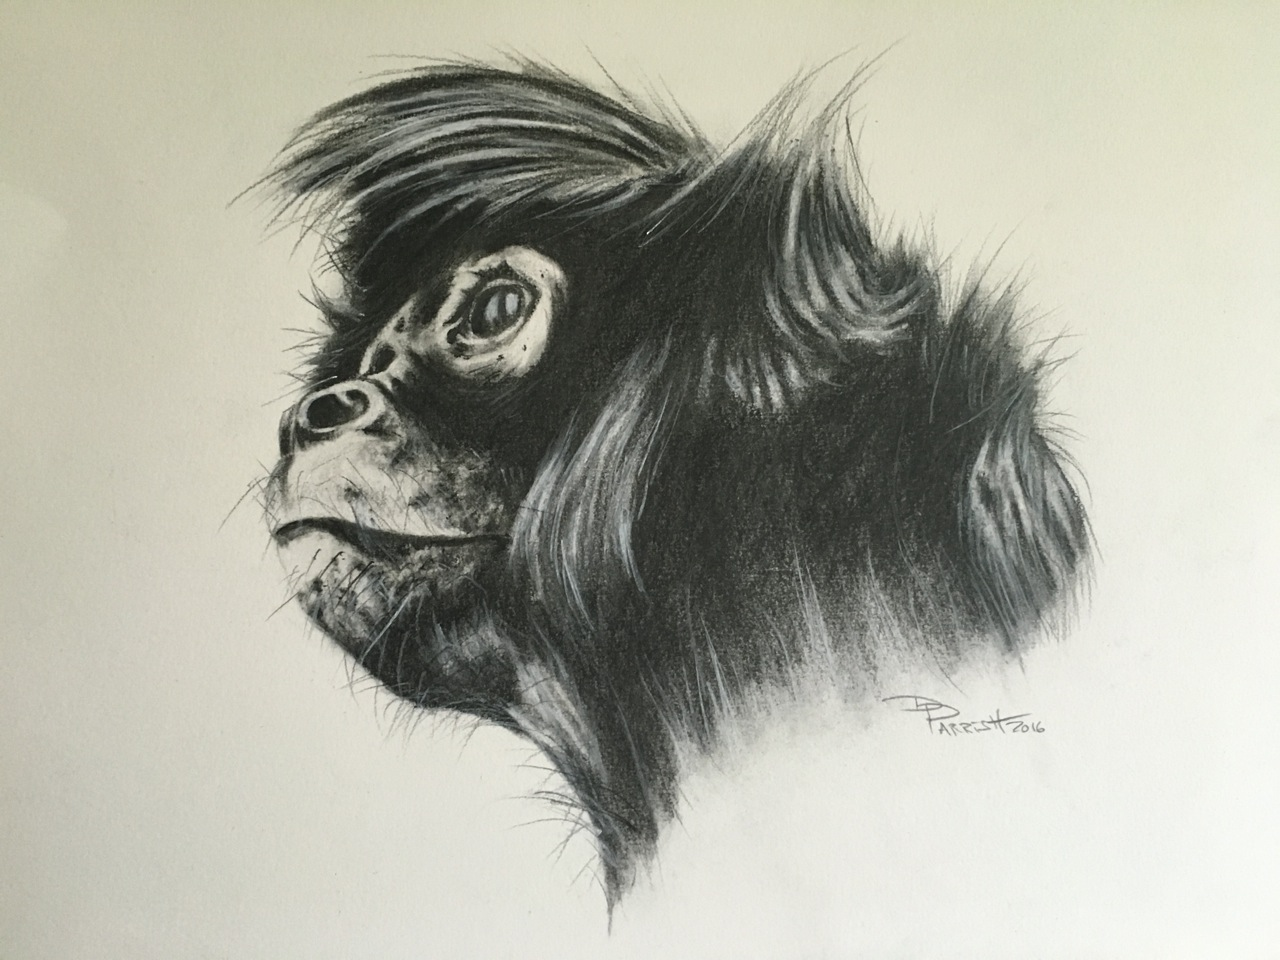 Spider Monkey 2016